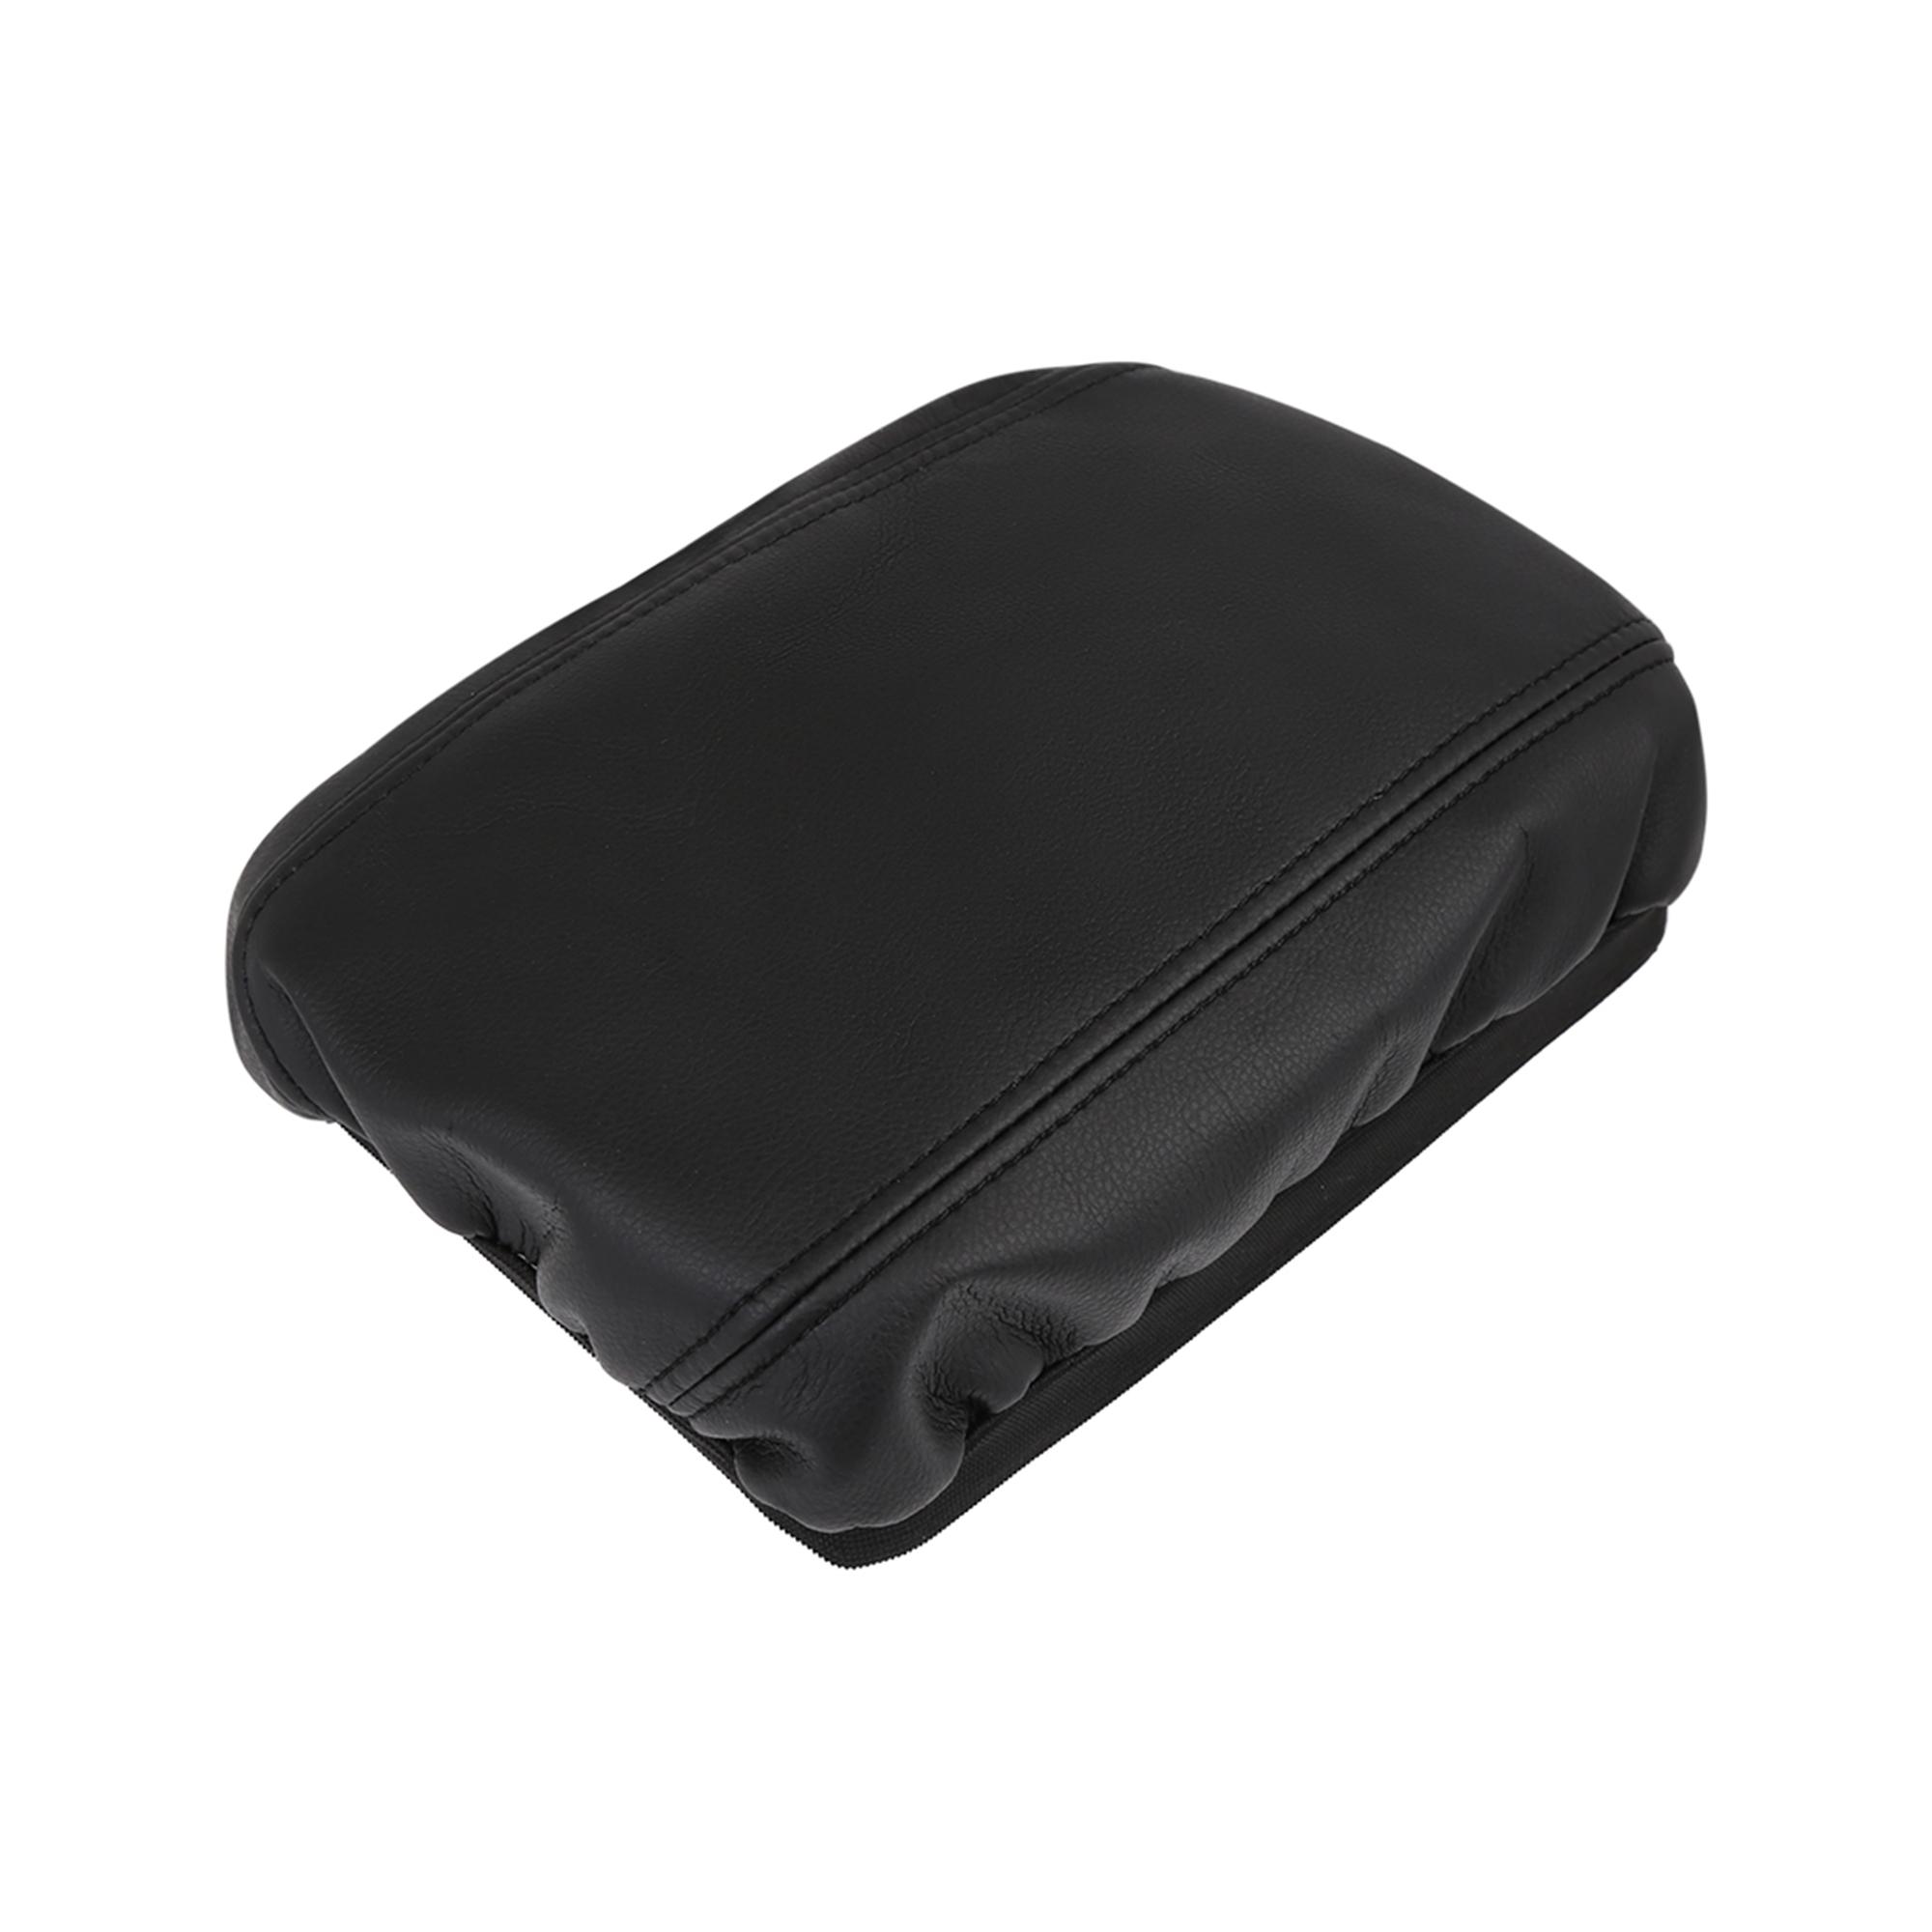 Microfiber Leather Center Console Lid Armrest Cover BK for 2006-11 Honda Civic